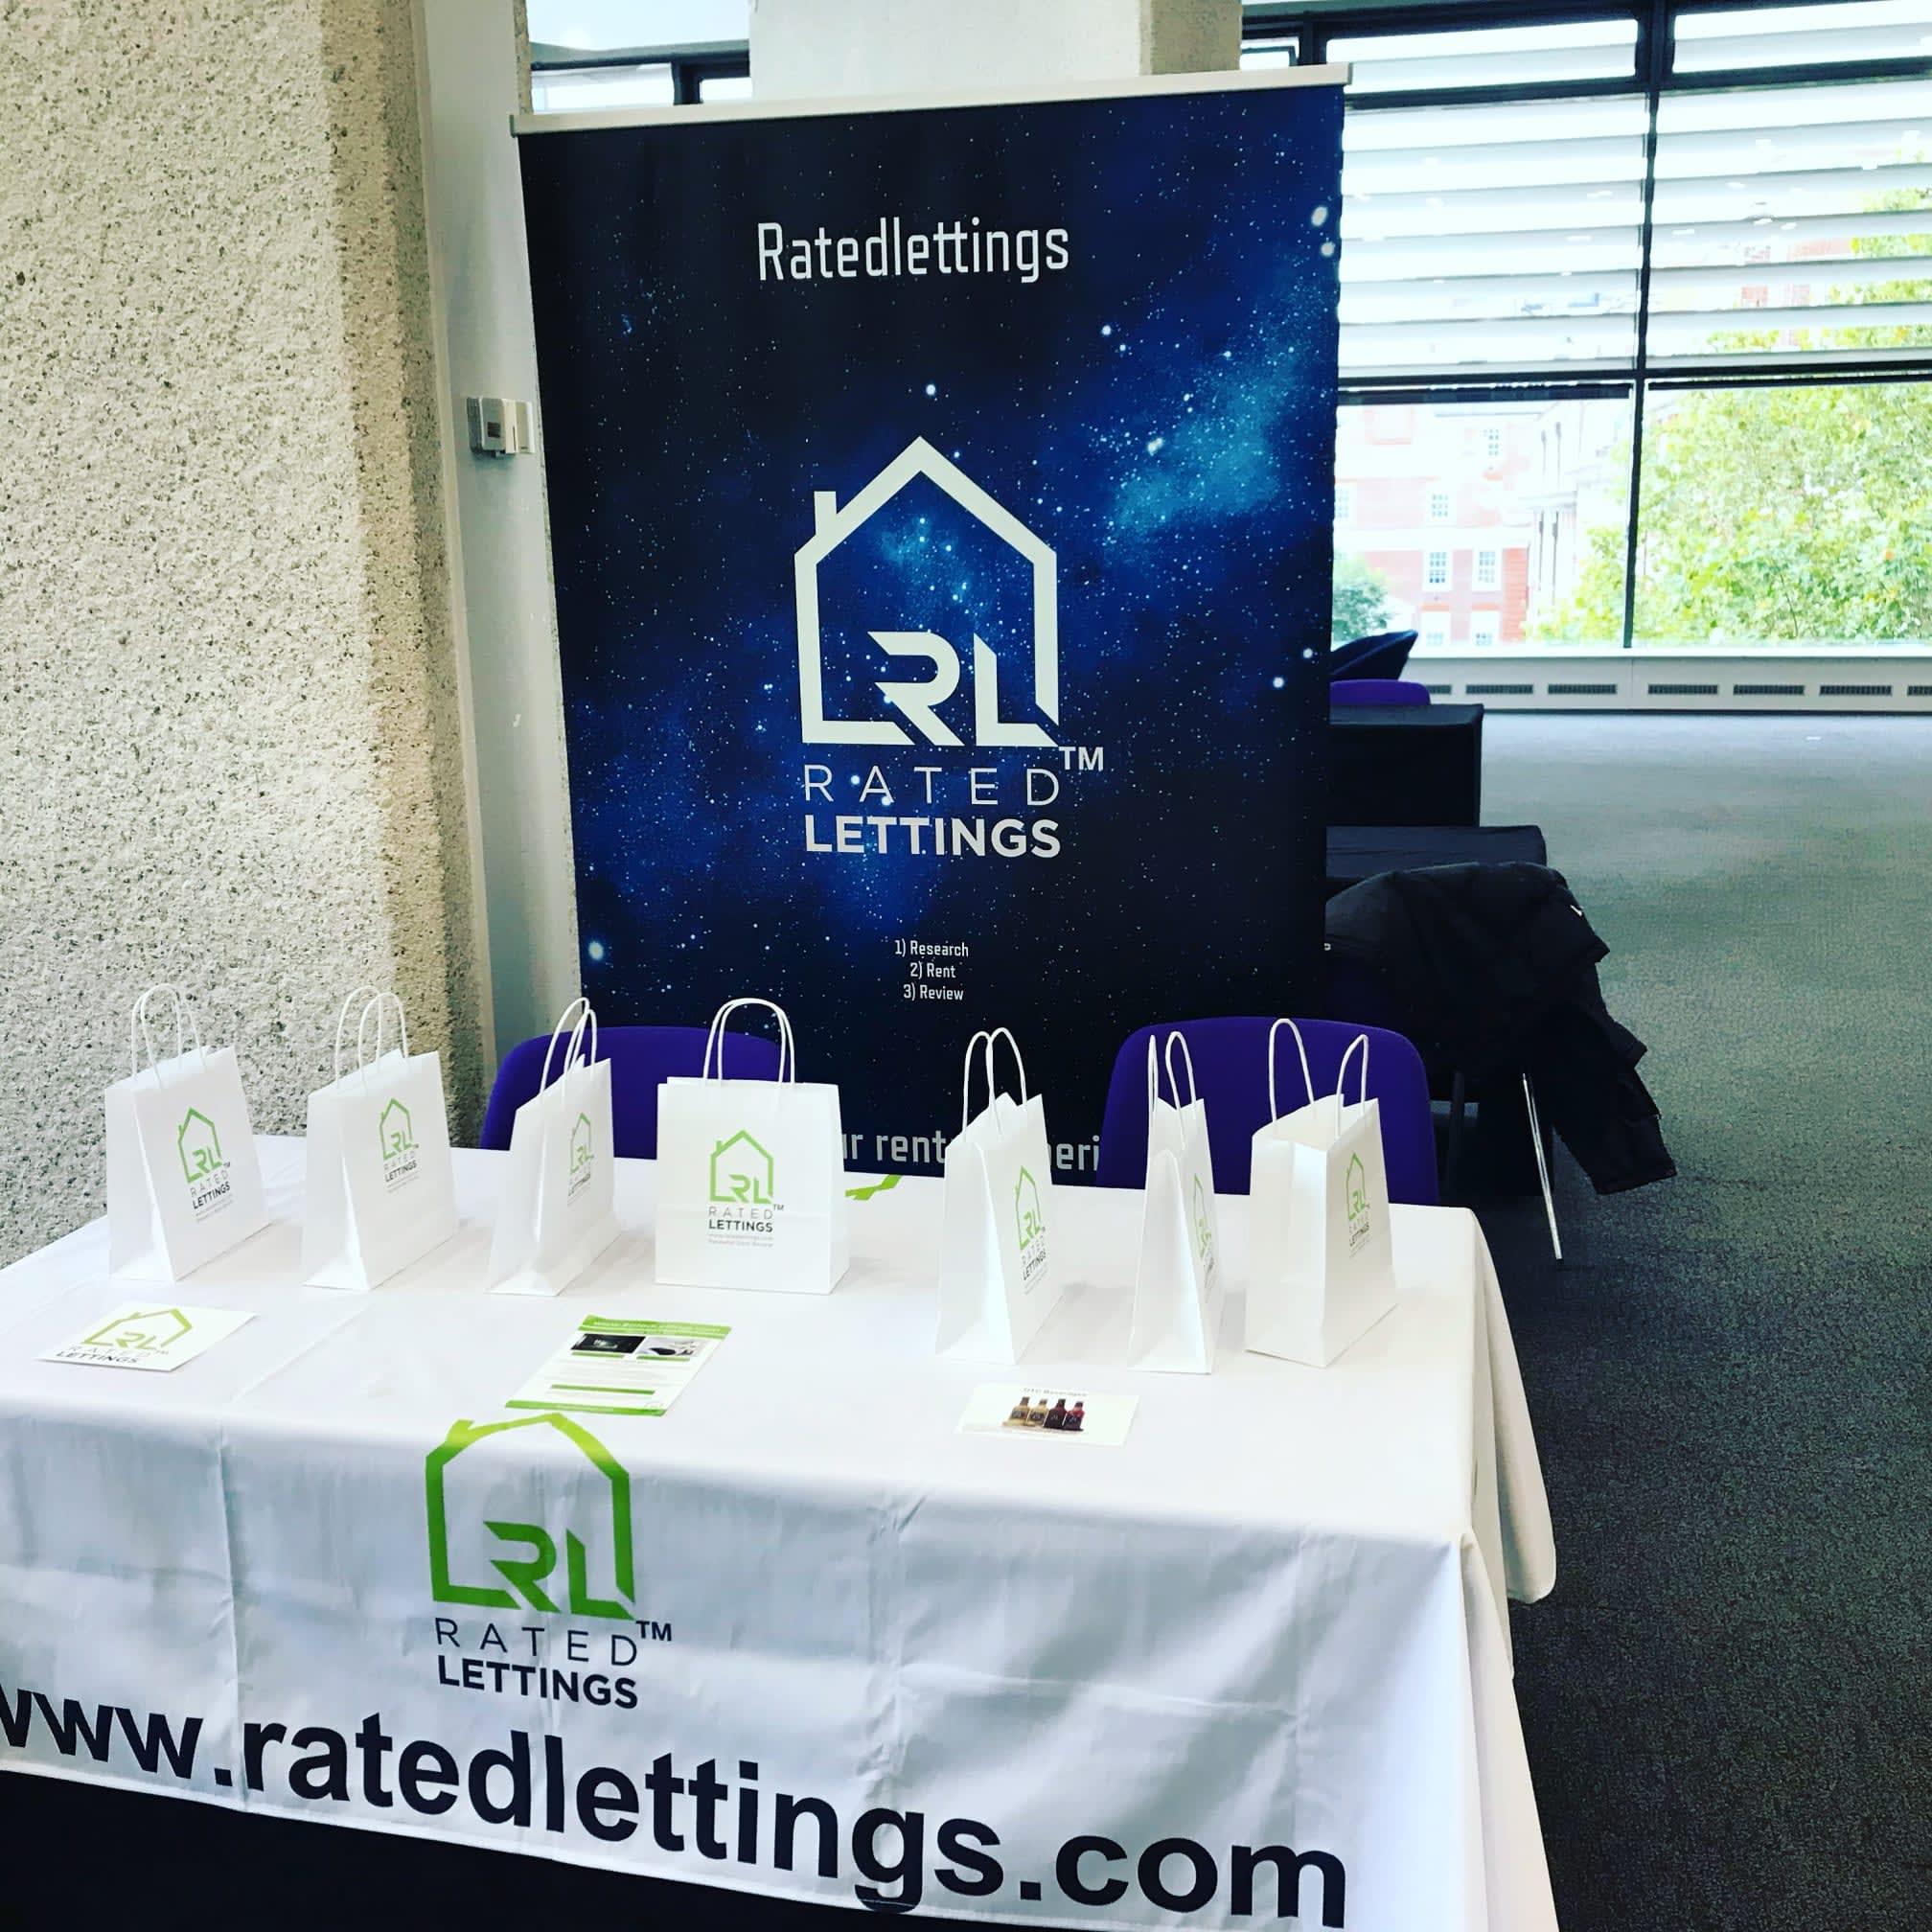 Ratedlettings.com